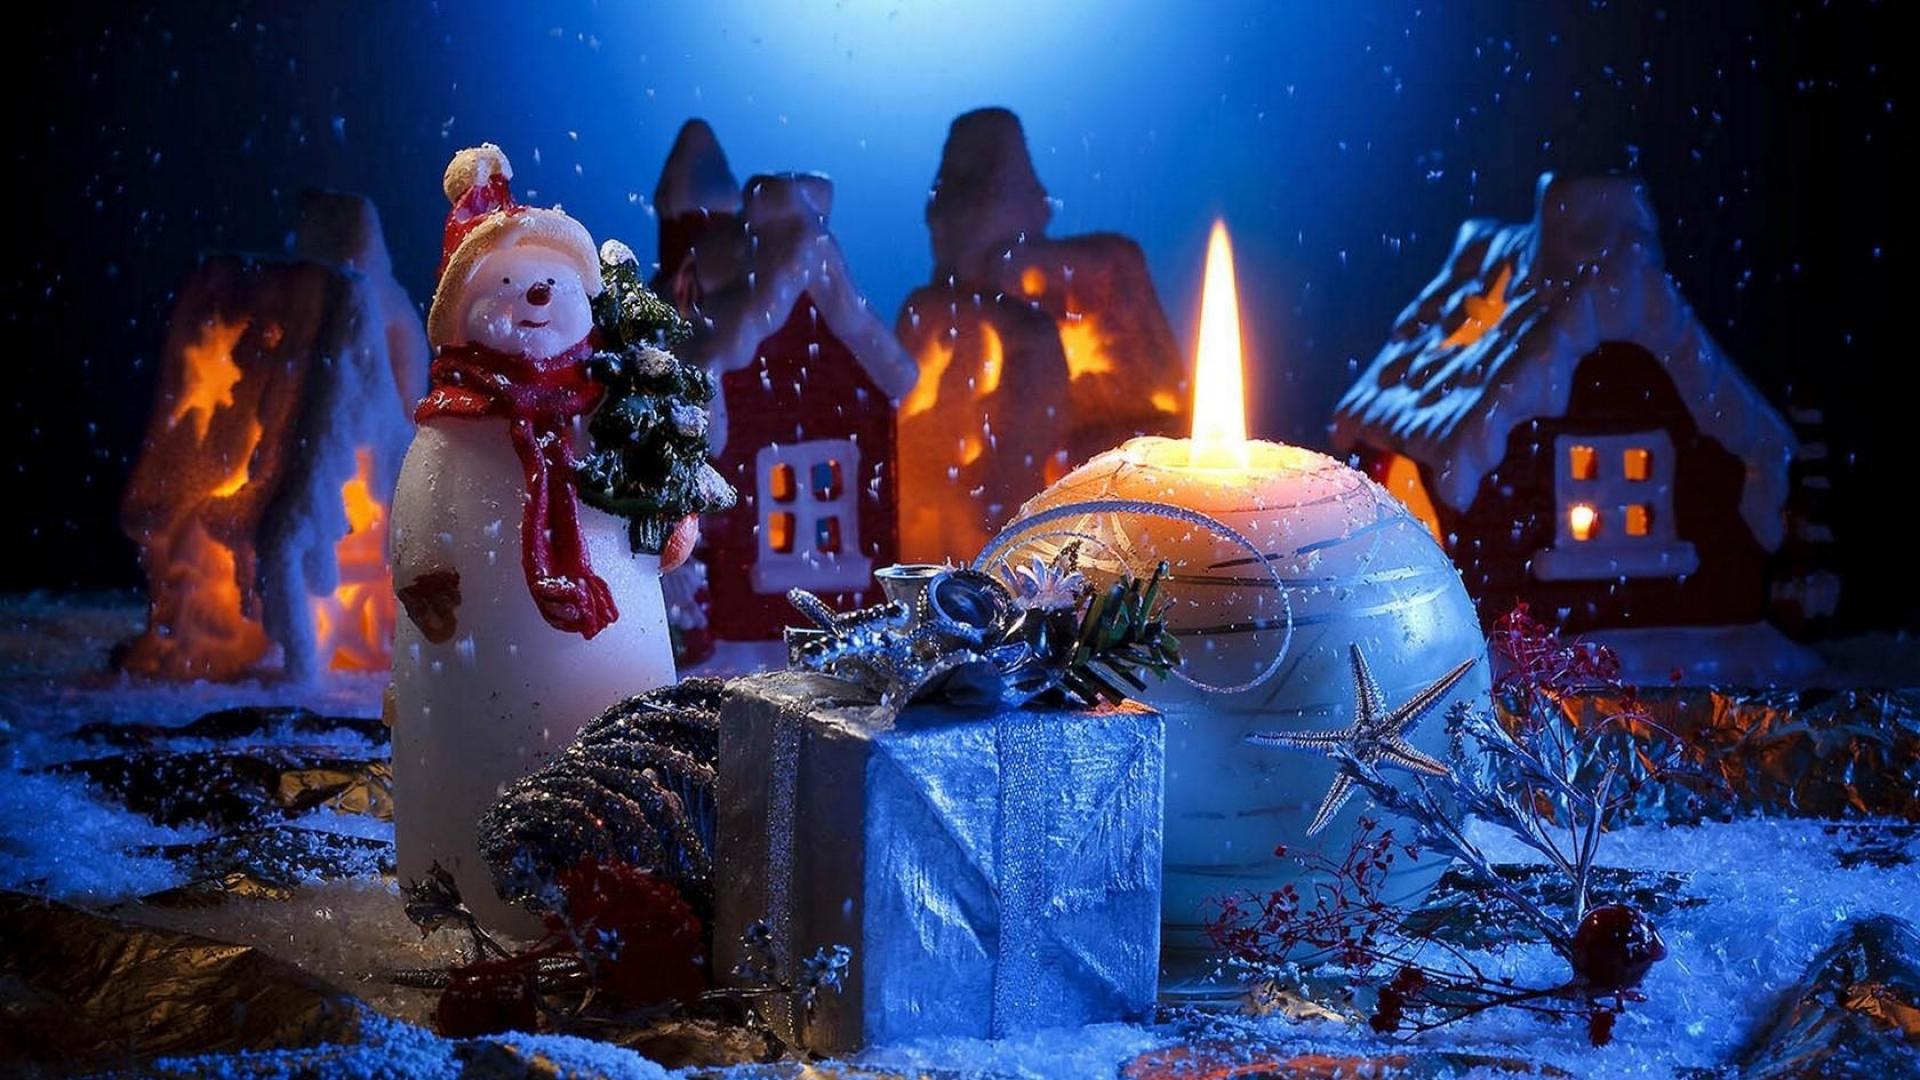 [40+] Christmas HD Wallpaper 1080p 1920x1080 On